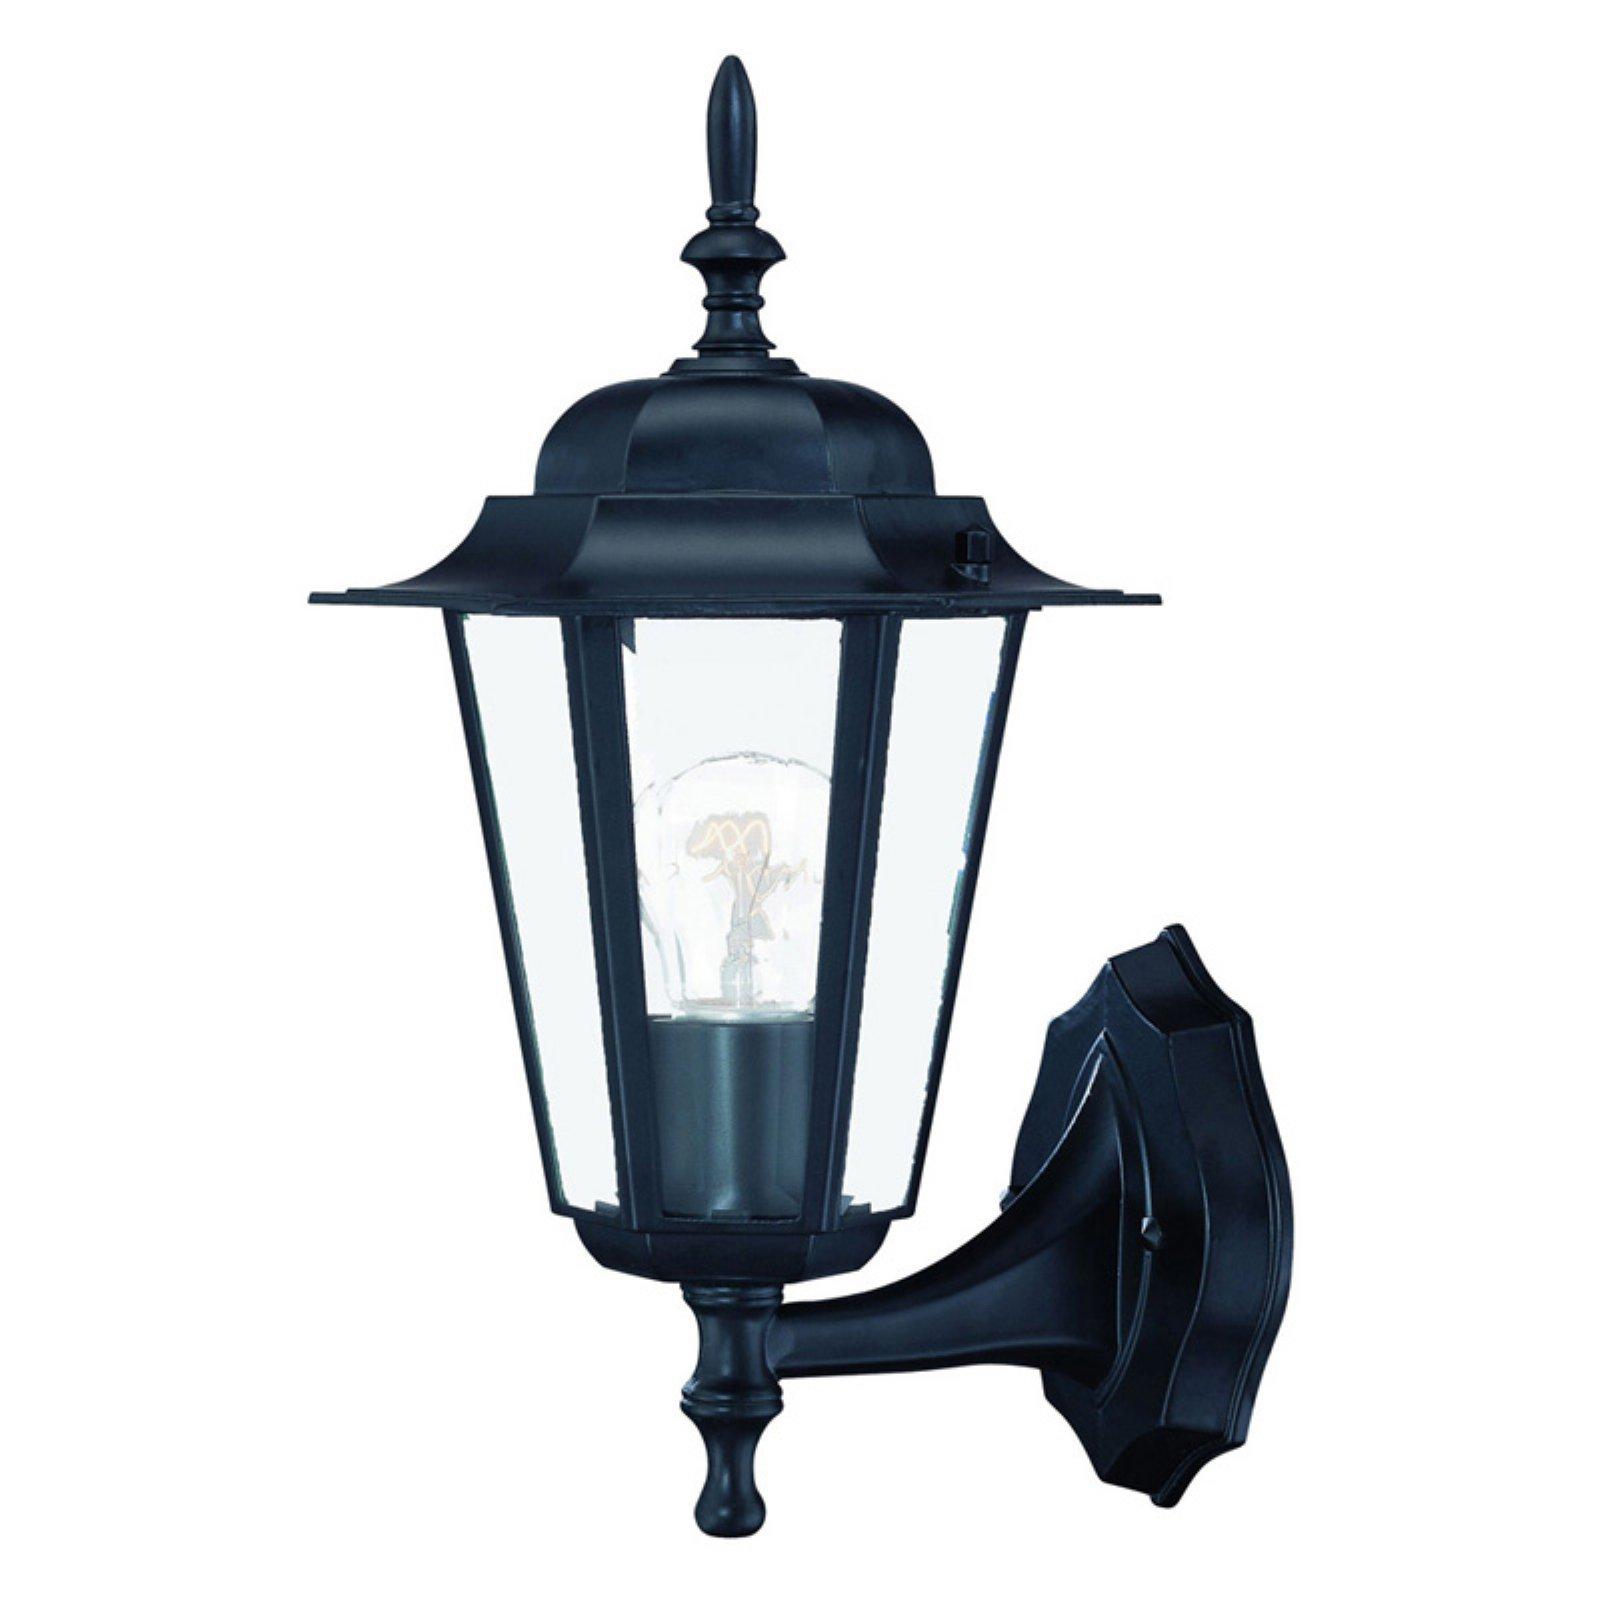 Acclaim Lighting Camelot Outdoor Wall Mount Light Fixture